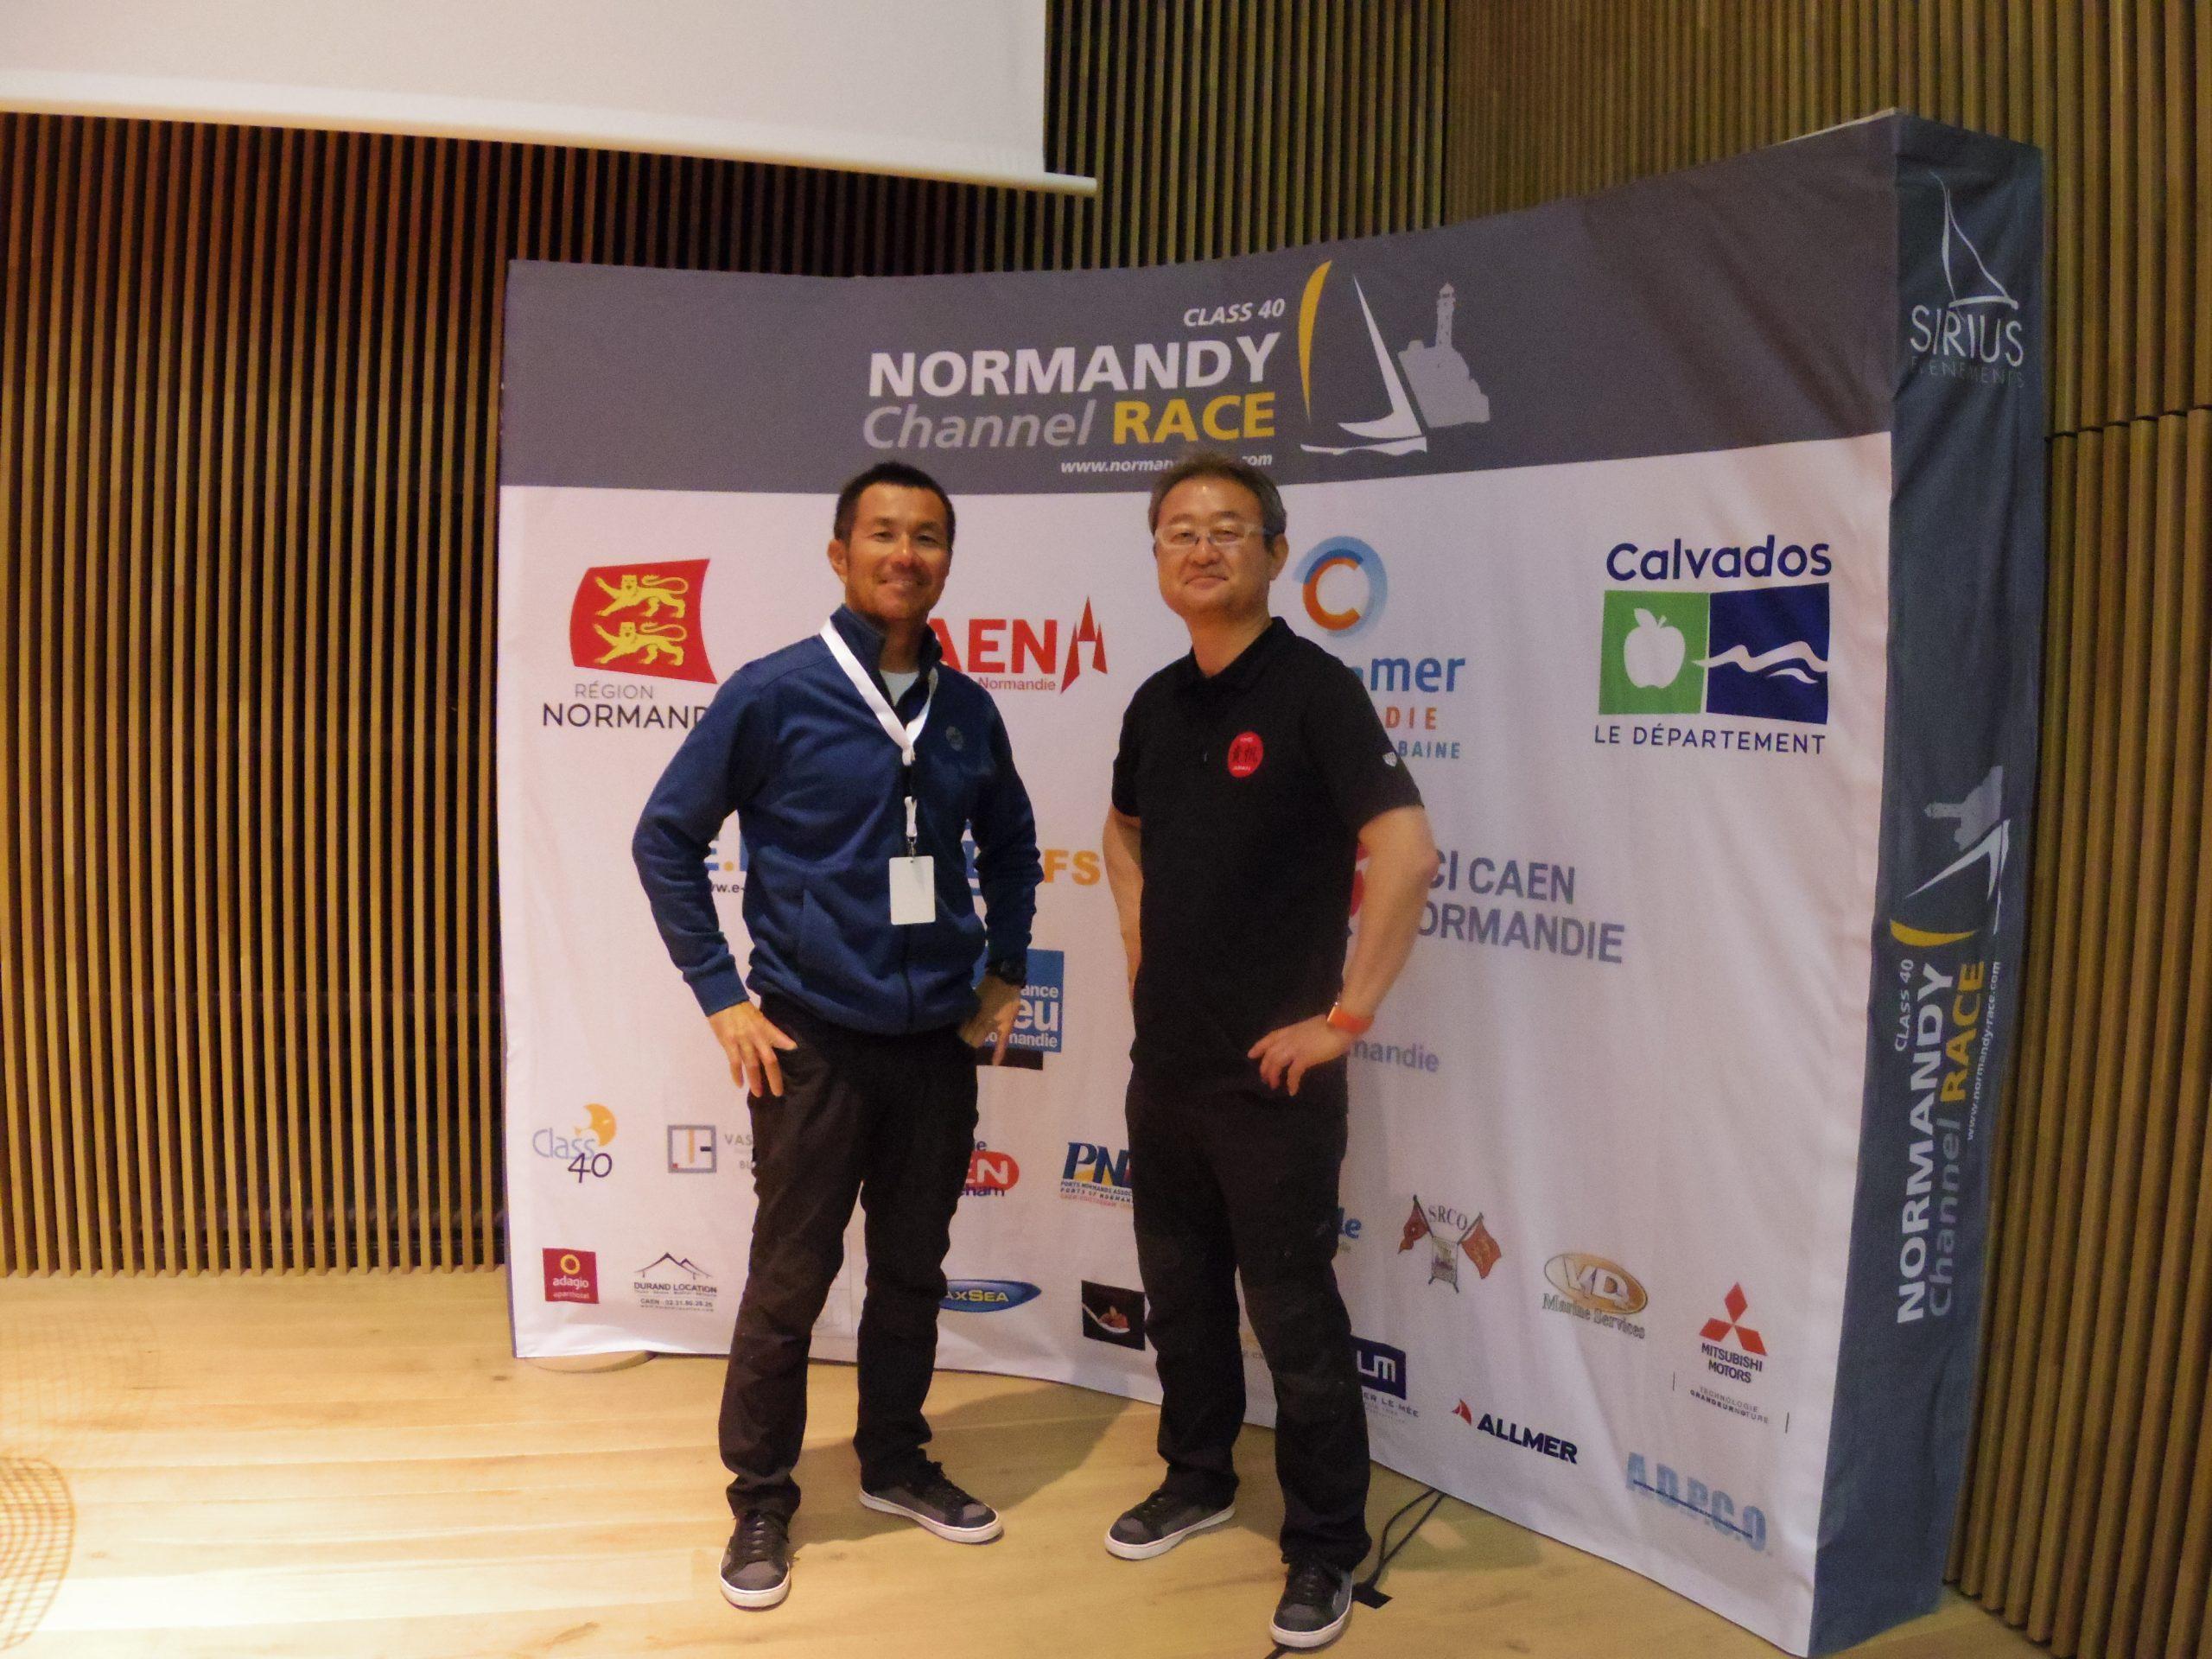 NORMANDY CHANNEL RACE 2017